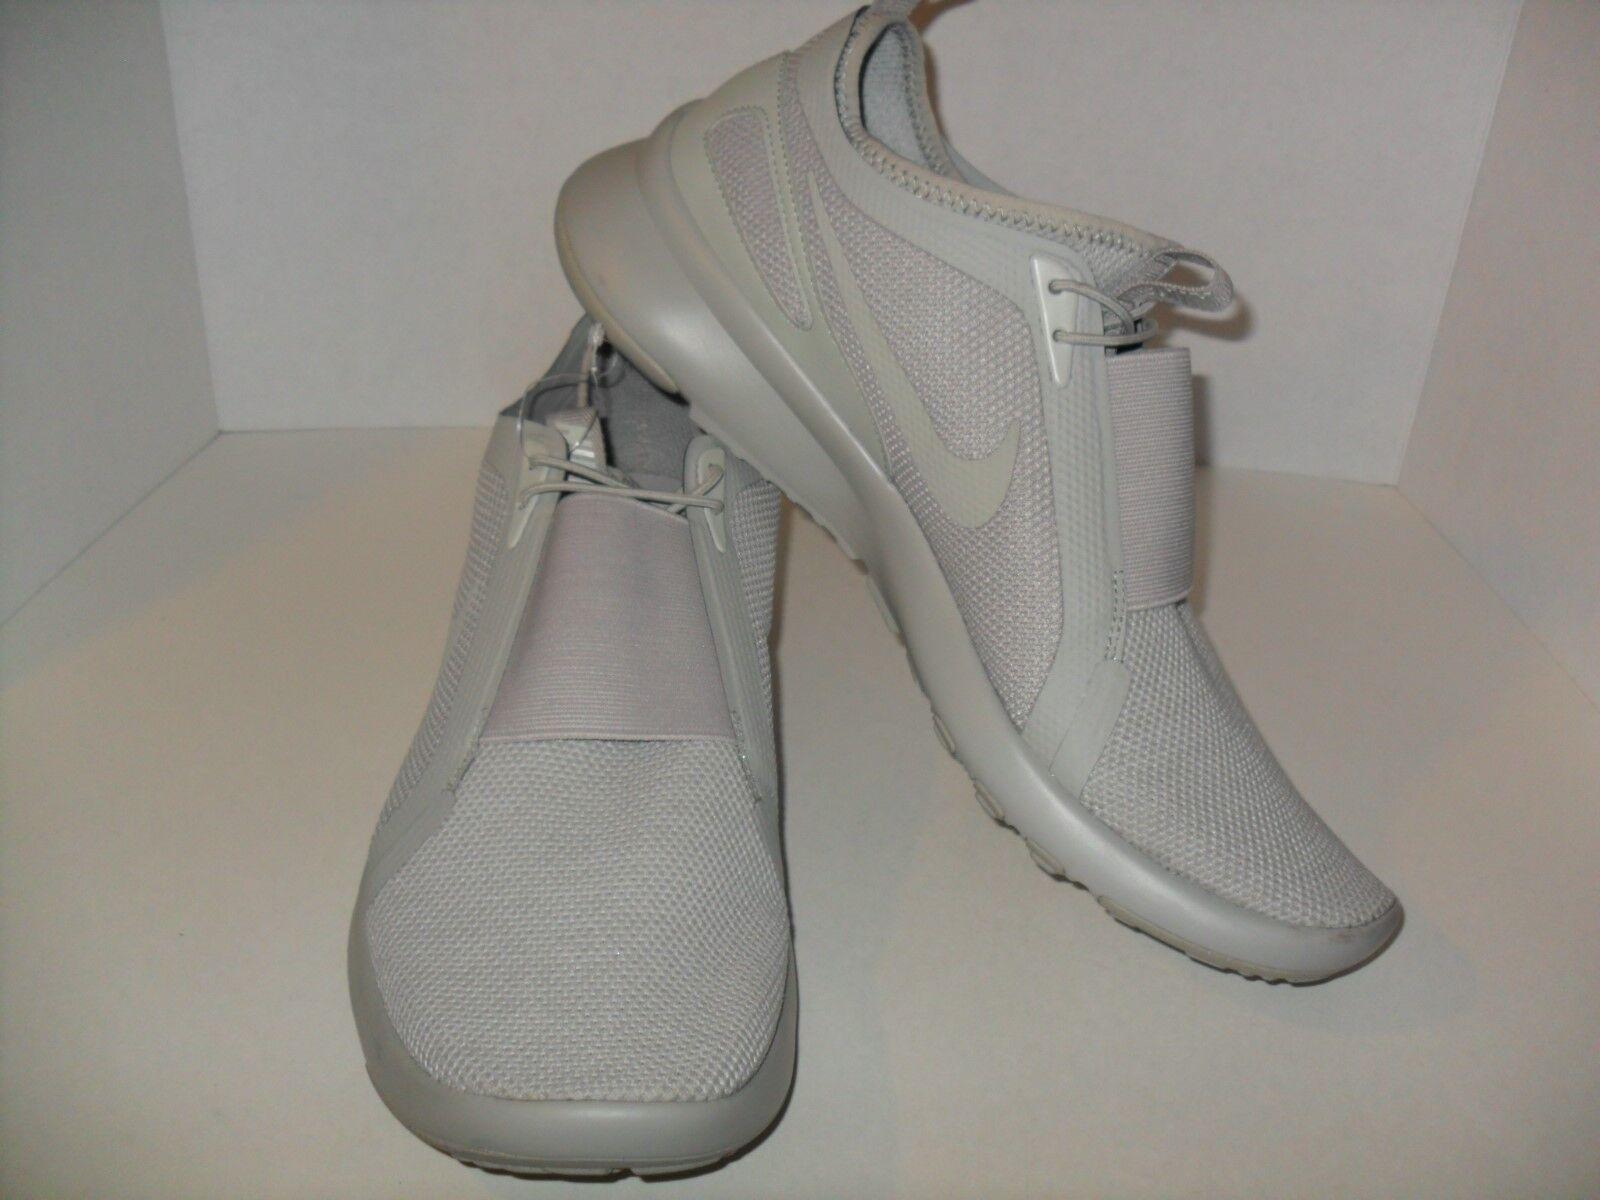 Nike Current Slip On BR Grey 903895-002 - Breathe Dart Presto Flyknit Tech Sock